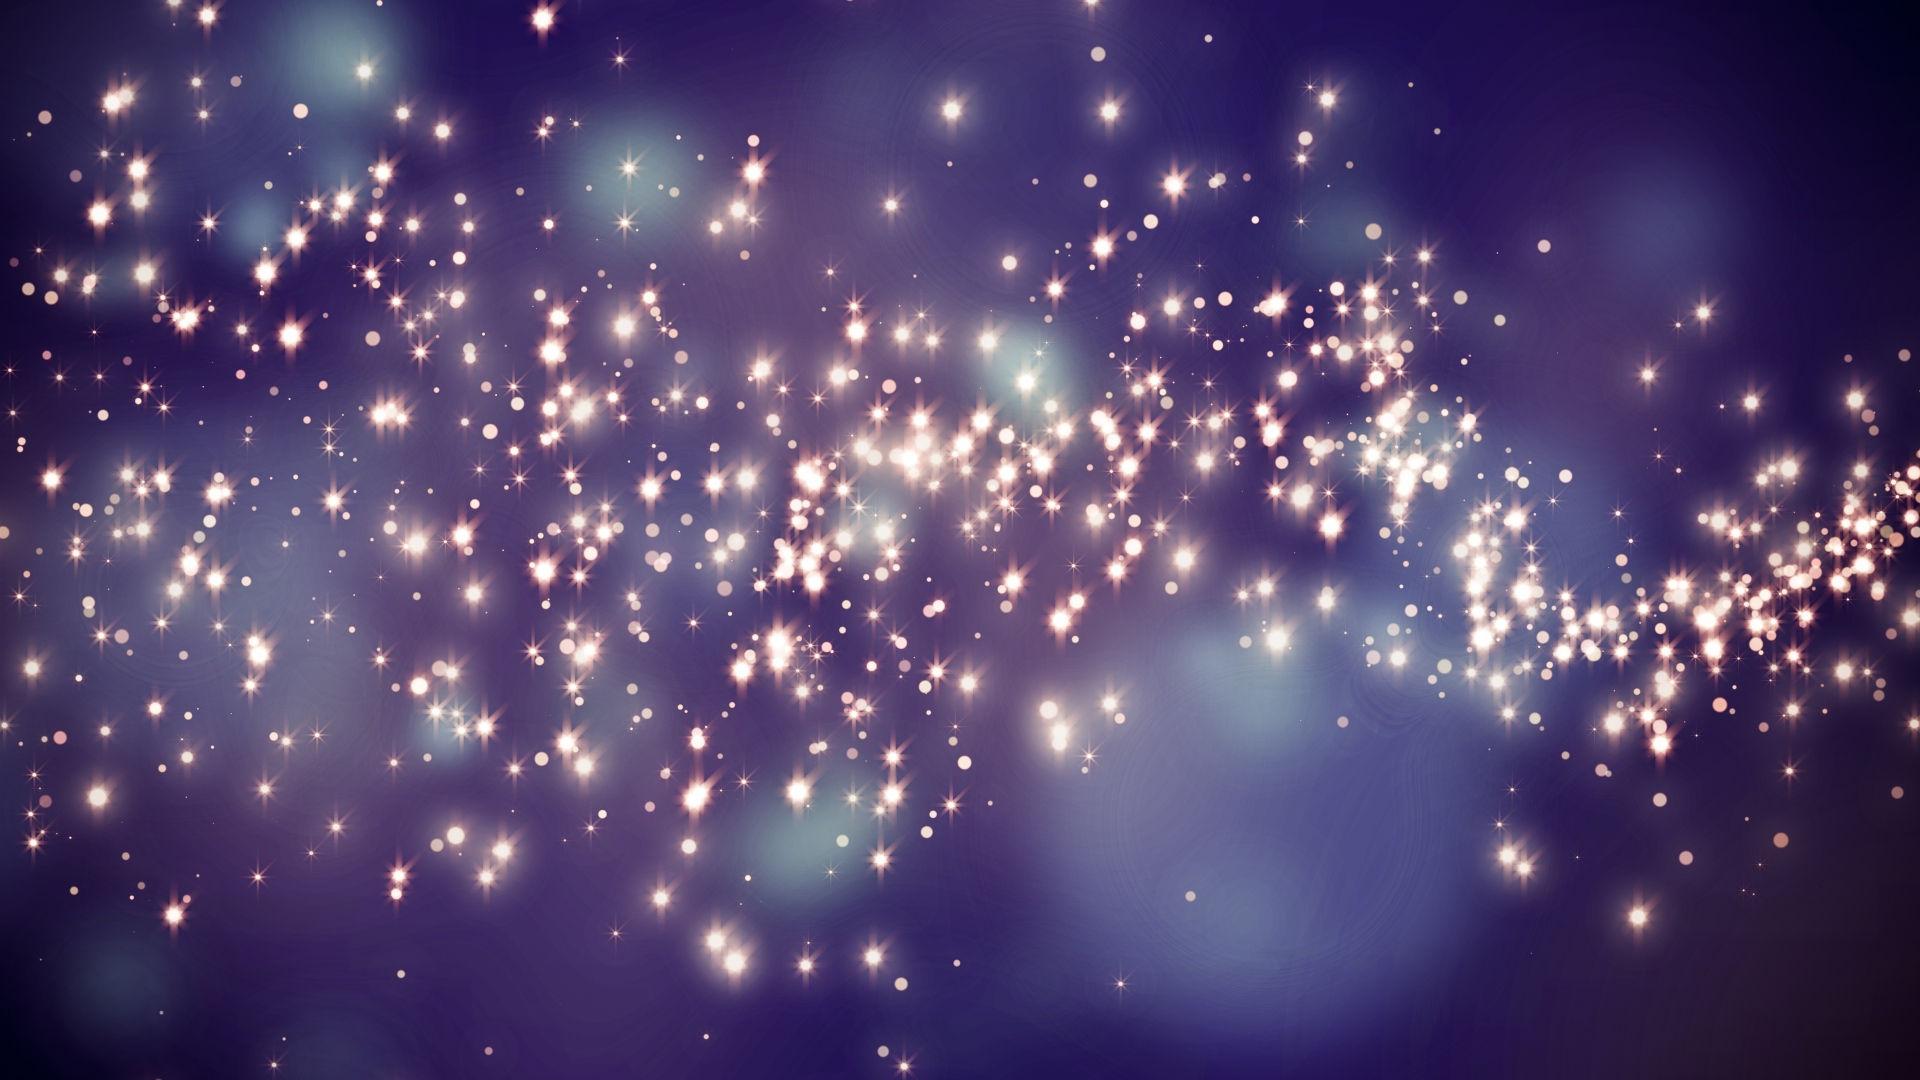 Stars Reflections Wallpaper